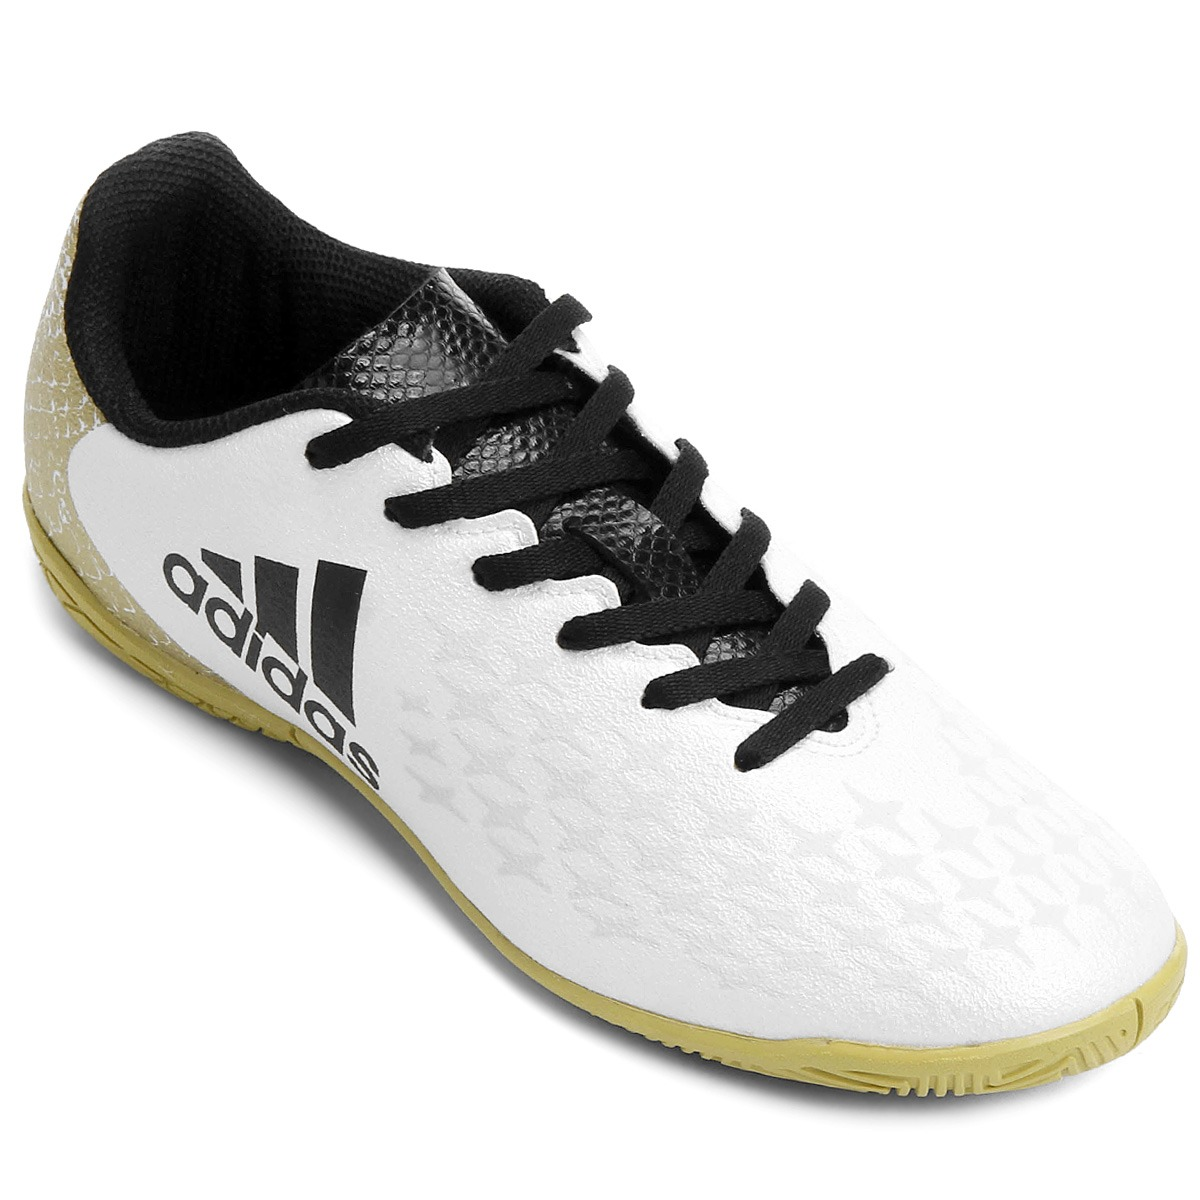 5c7753c163aca chuteira futsal adidas juvenil x16 30 - 34 - branco. Carregando zoom.